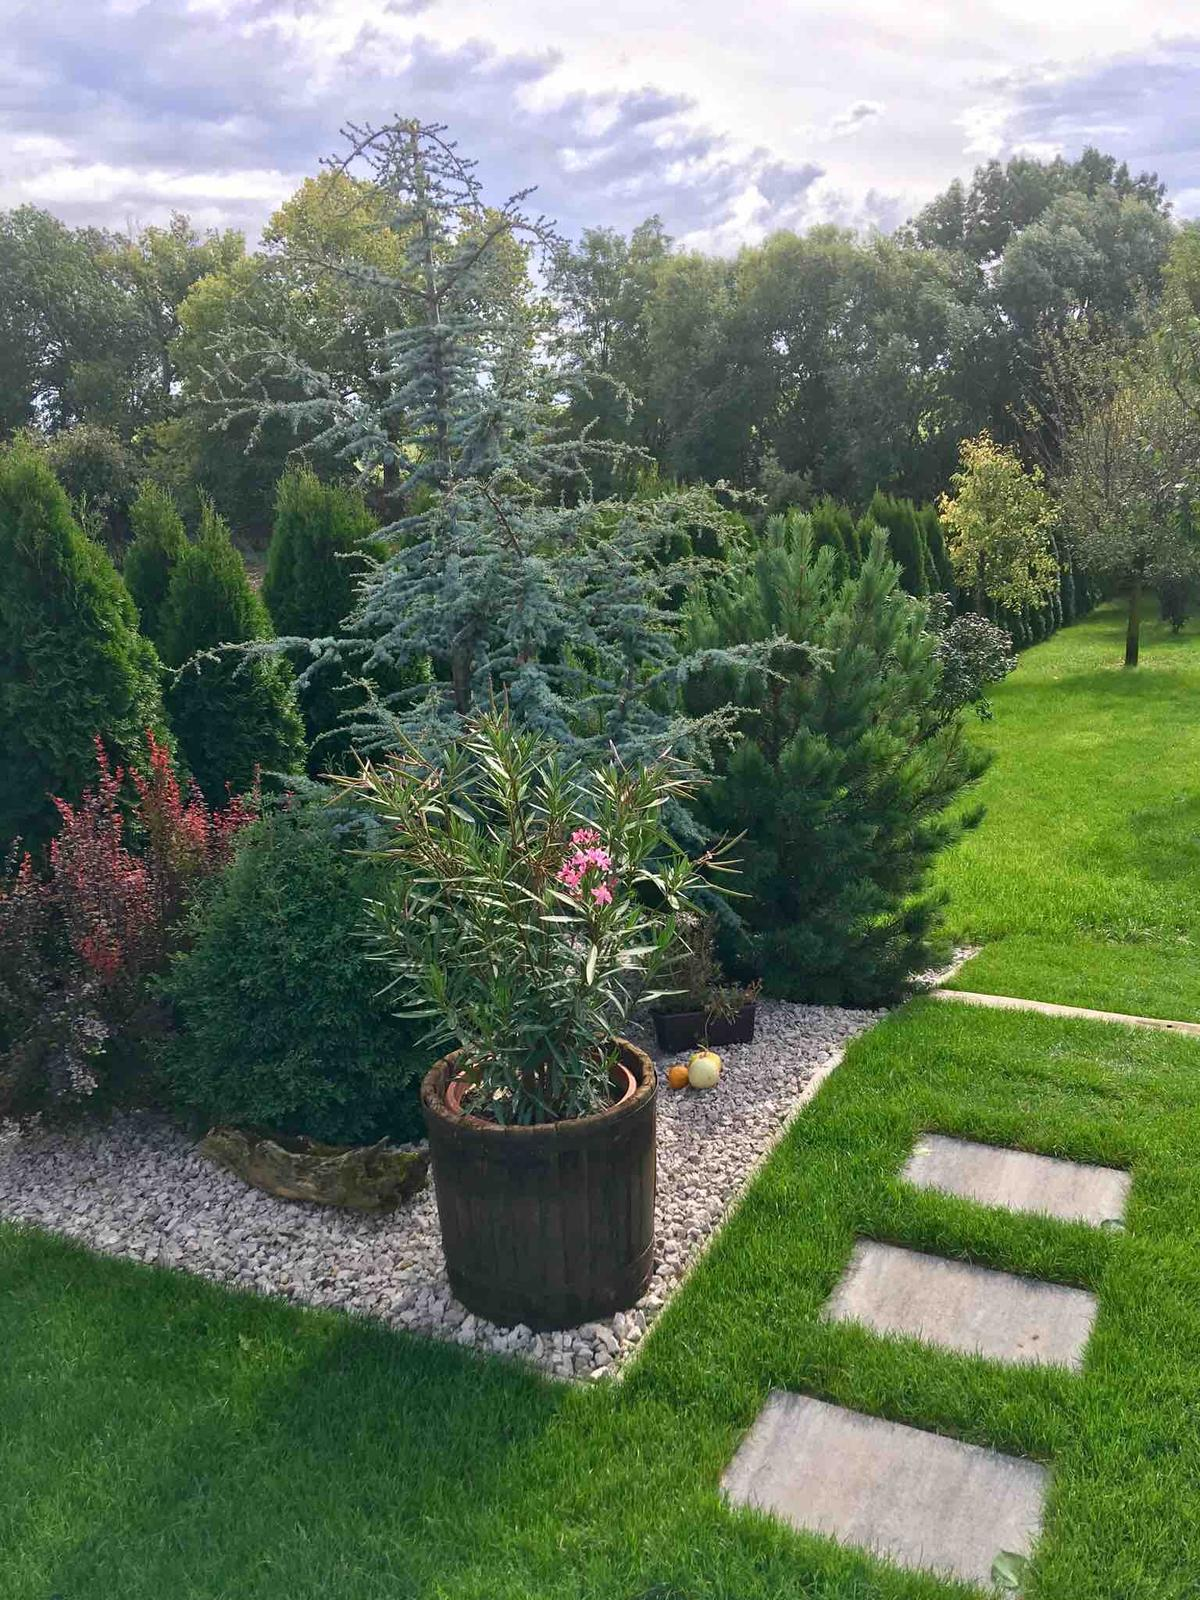 Názov stavby 3 - in da garden - september 2018